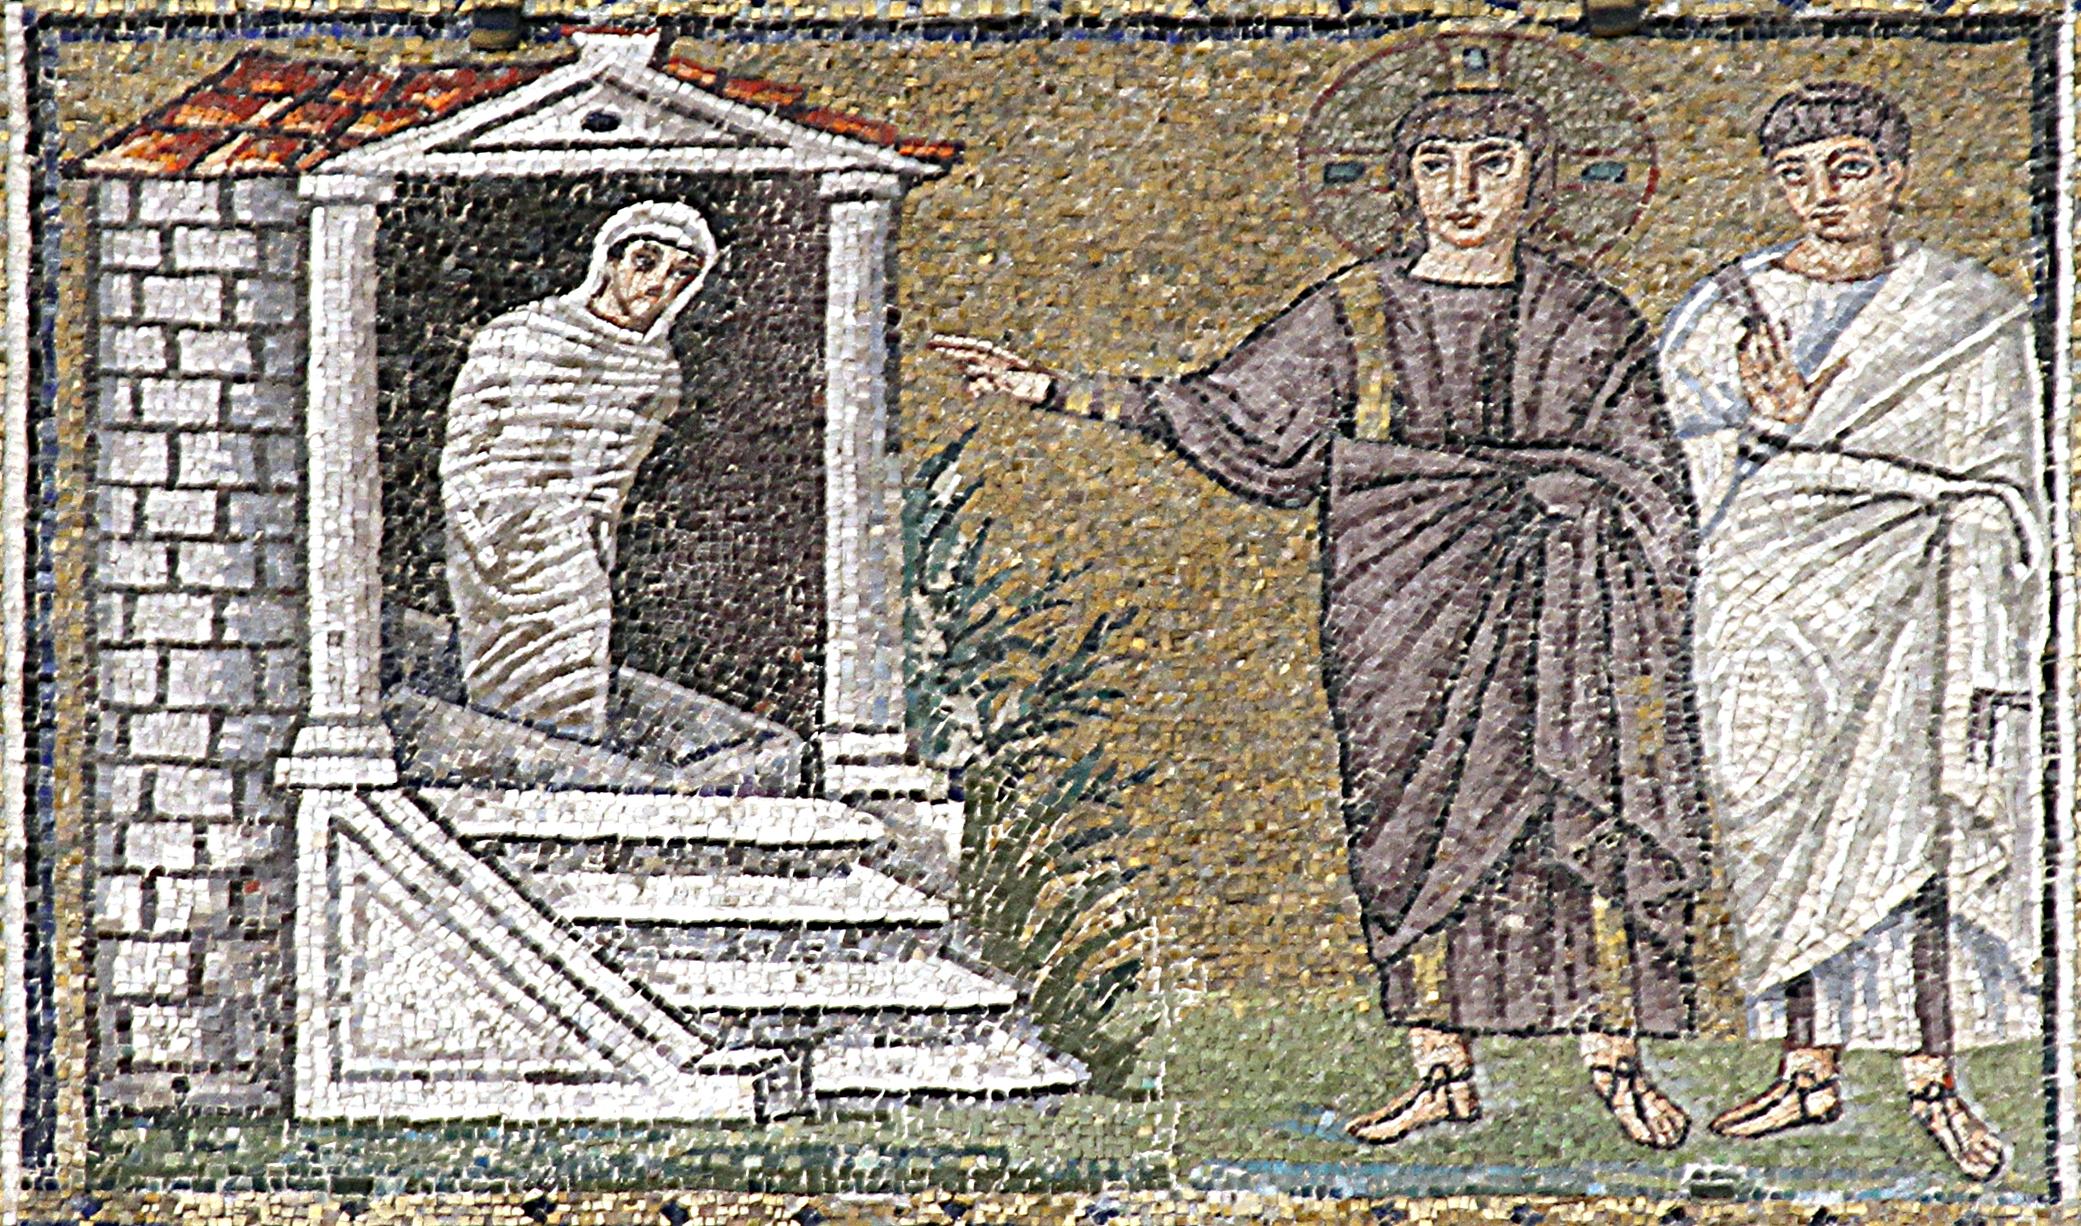 Resurrection_of_Lazarus_Ravenna_Sant_Apollinare_Nuovo_2016